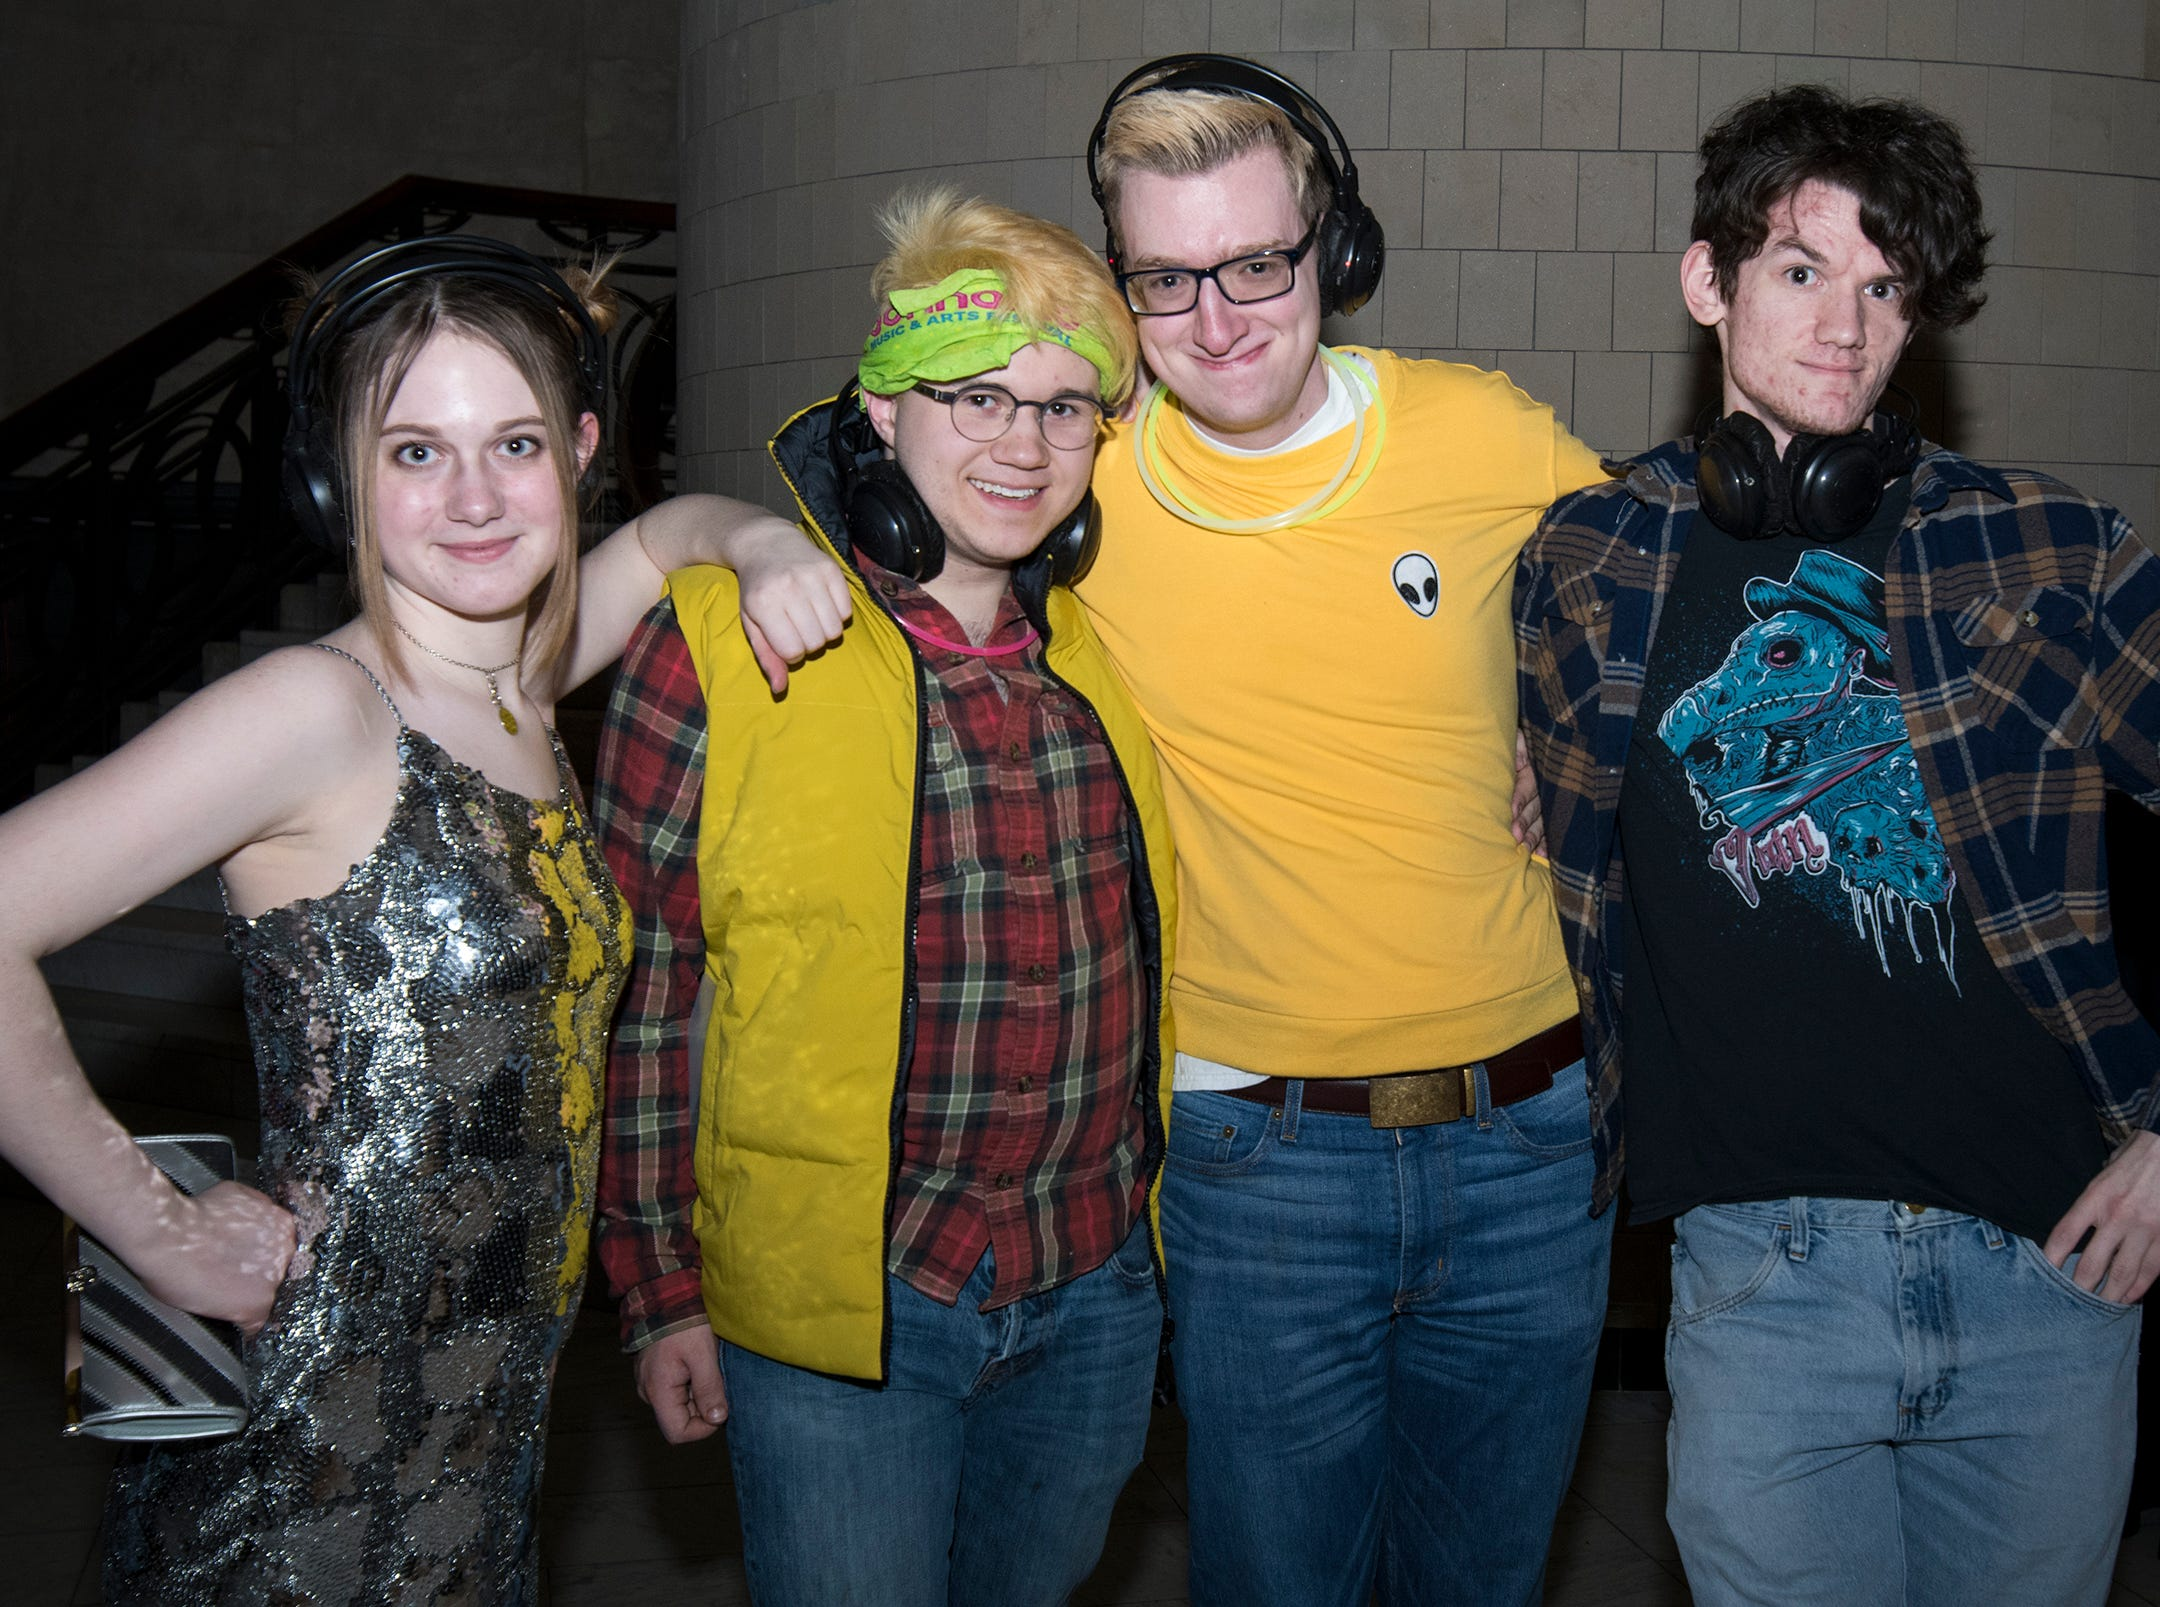 Rowan Threnody, Nicholai Lekson, TJ Snape and Kameron Franklin attend a 90s-themed silent disco during Art After Dark at the Cincinnati Art Museum Friday, January 25, 2019 in Cincinnati, Ohio.